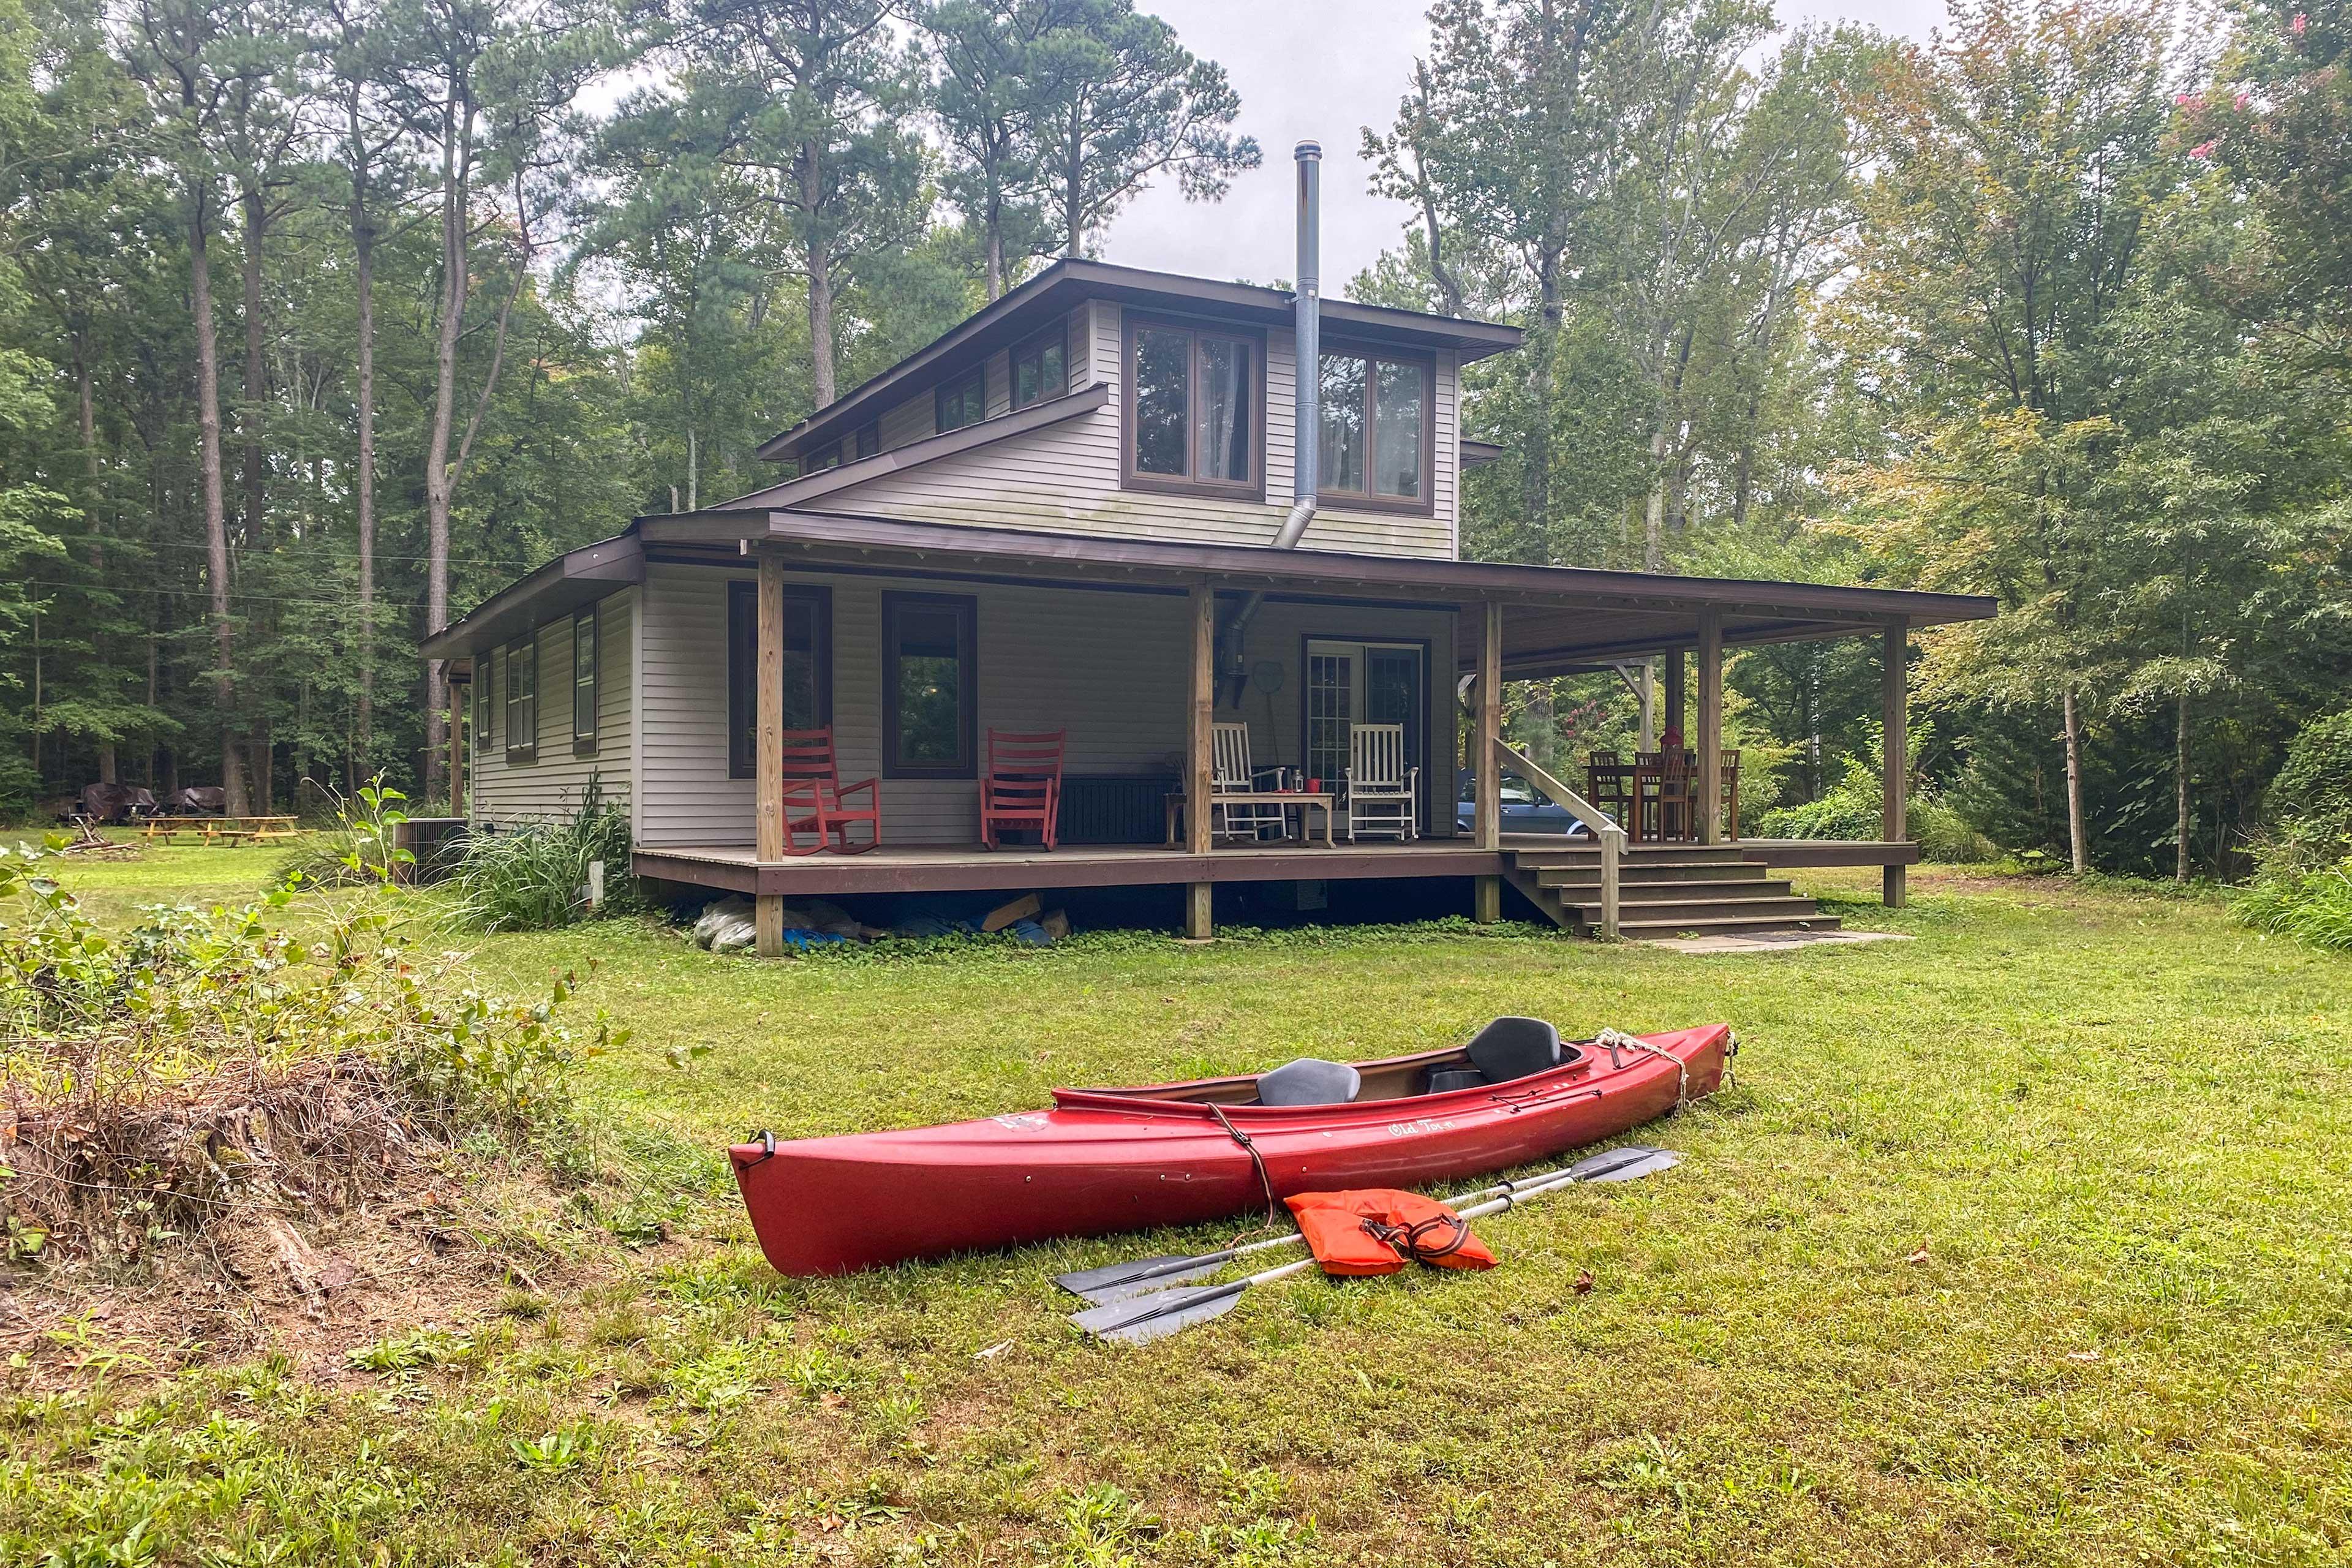 Private Yard | Kayak, Paddles & Lifejackets Provided